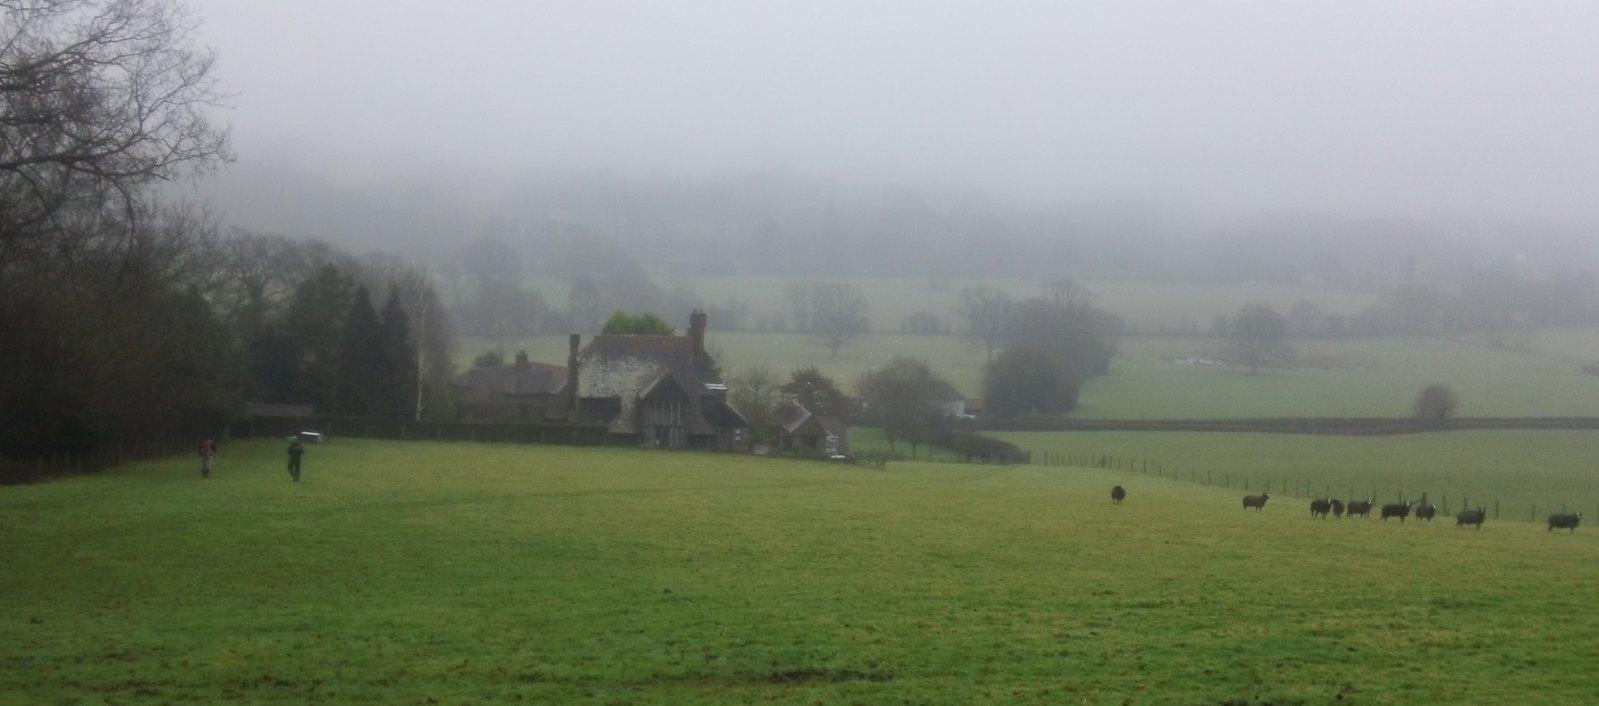 Black sheep see us coming! Farm near Fordcombe, Kent